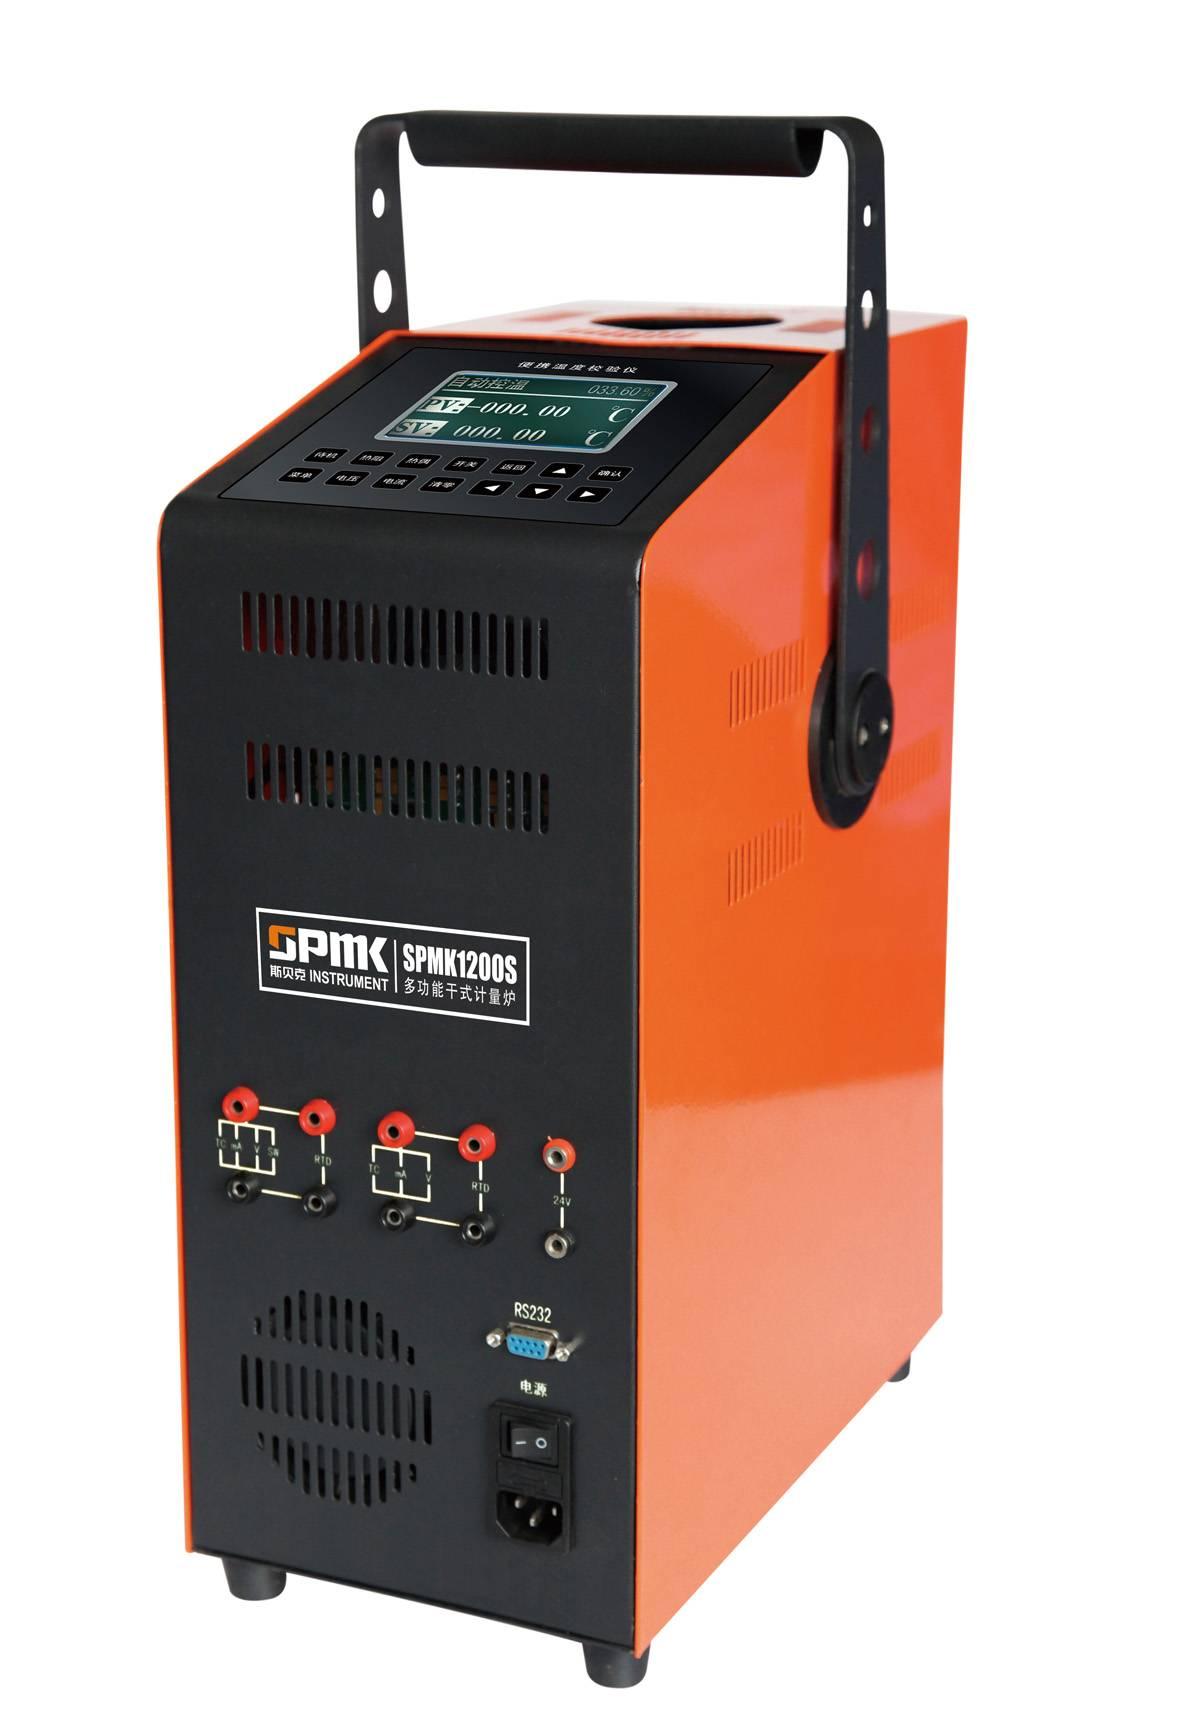 Heat Measuring Instruments : Portable temperature measuring instrument spmk c